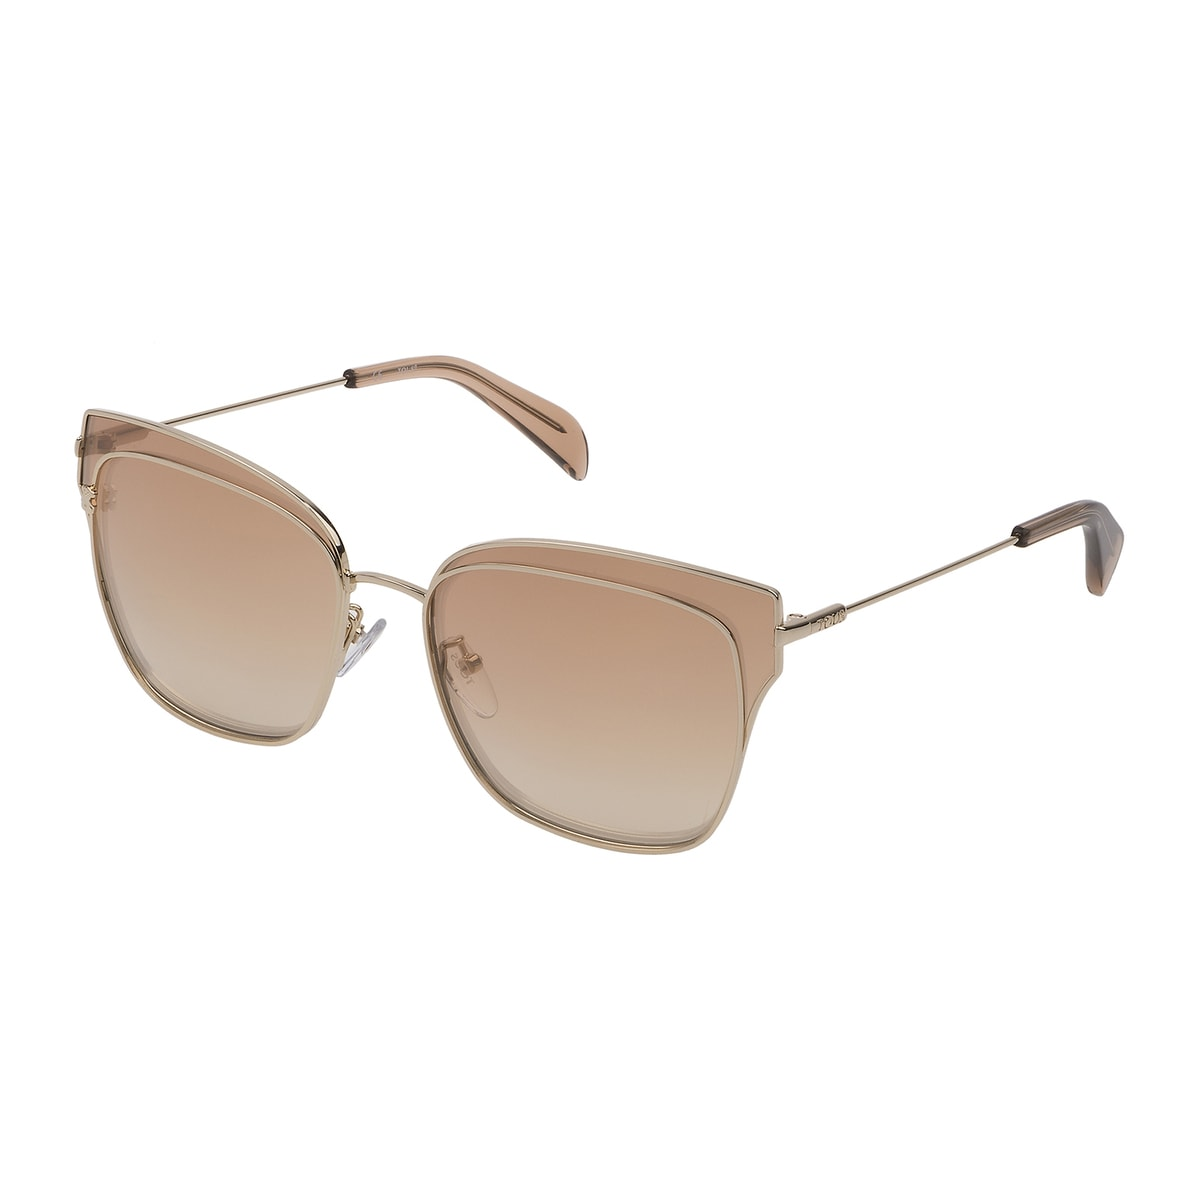 Light gold colored Metal Metal Bear Sunglasses